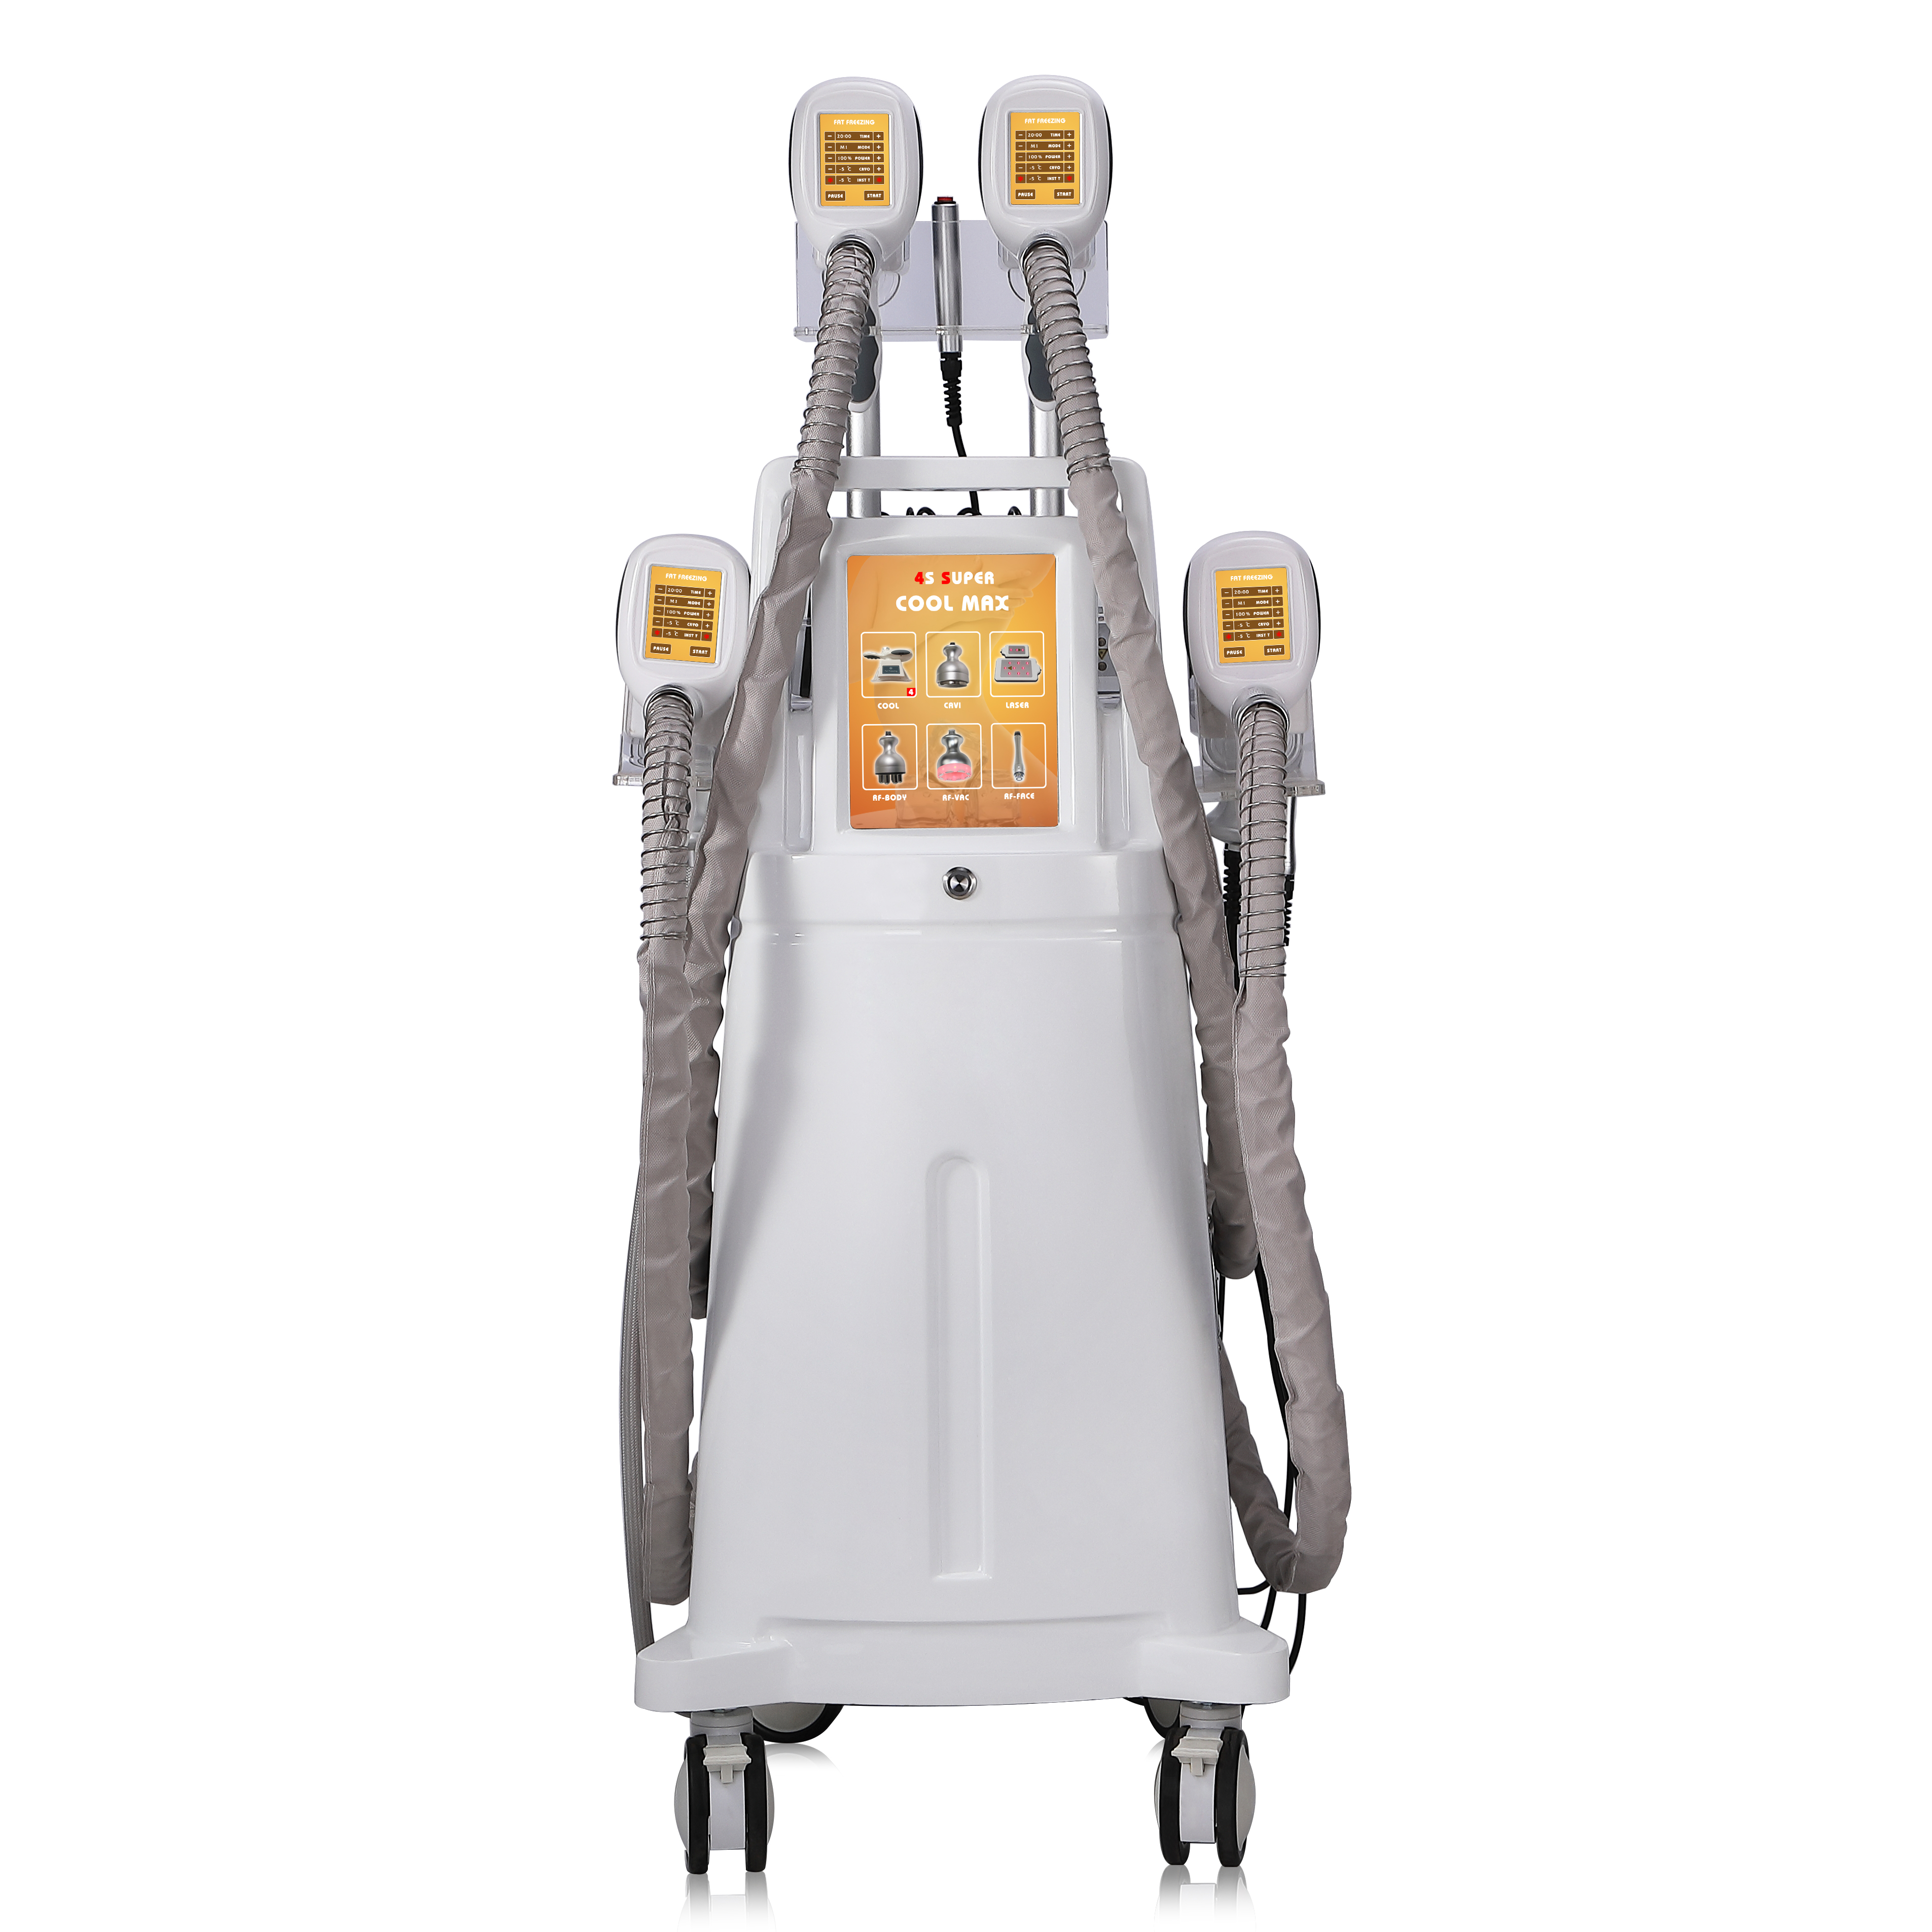 6 In 1 Multifunction Vacuum RF Lipo Laser Portable Cryo, Lipo Laser Portable/ Fat Freezing